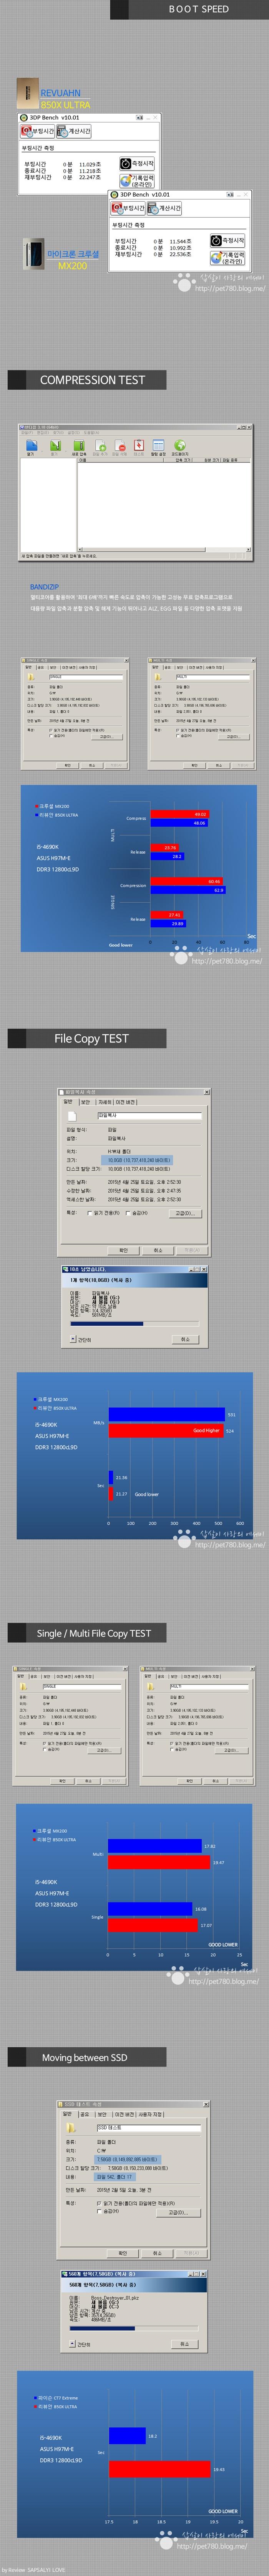 ����� 850X ULTRA (��Ʈ��) ����2 SLC ���� �÷��� SSD ��õ.jpg